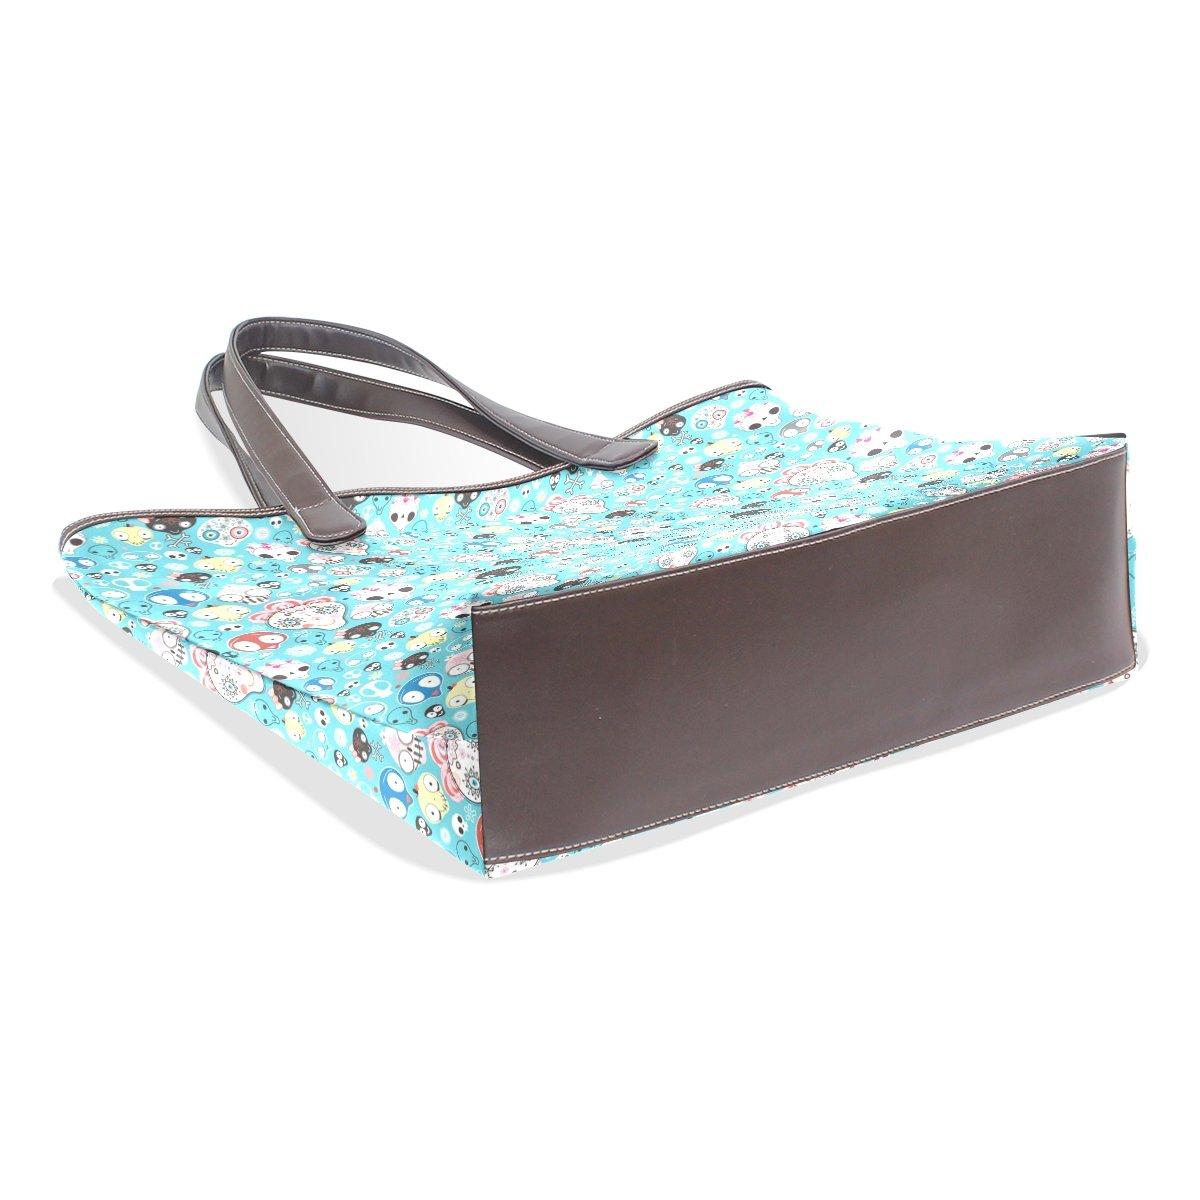 Ye Store Cute Skull Lady PU Leather Handbag Tote Bag Shoulder Bag Shopping Bag For